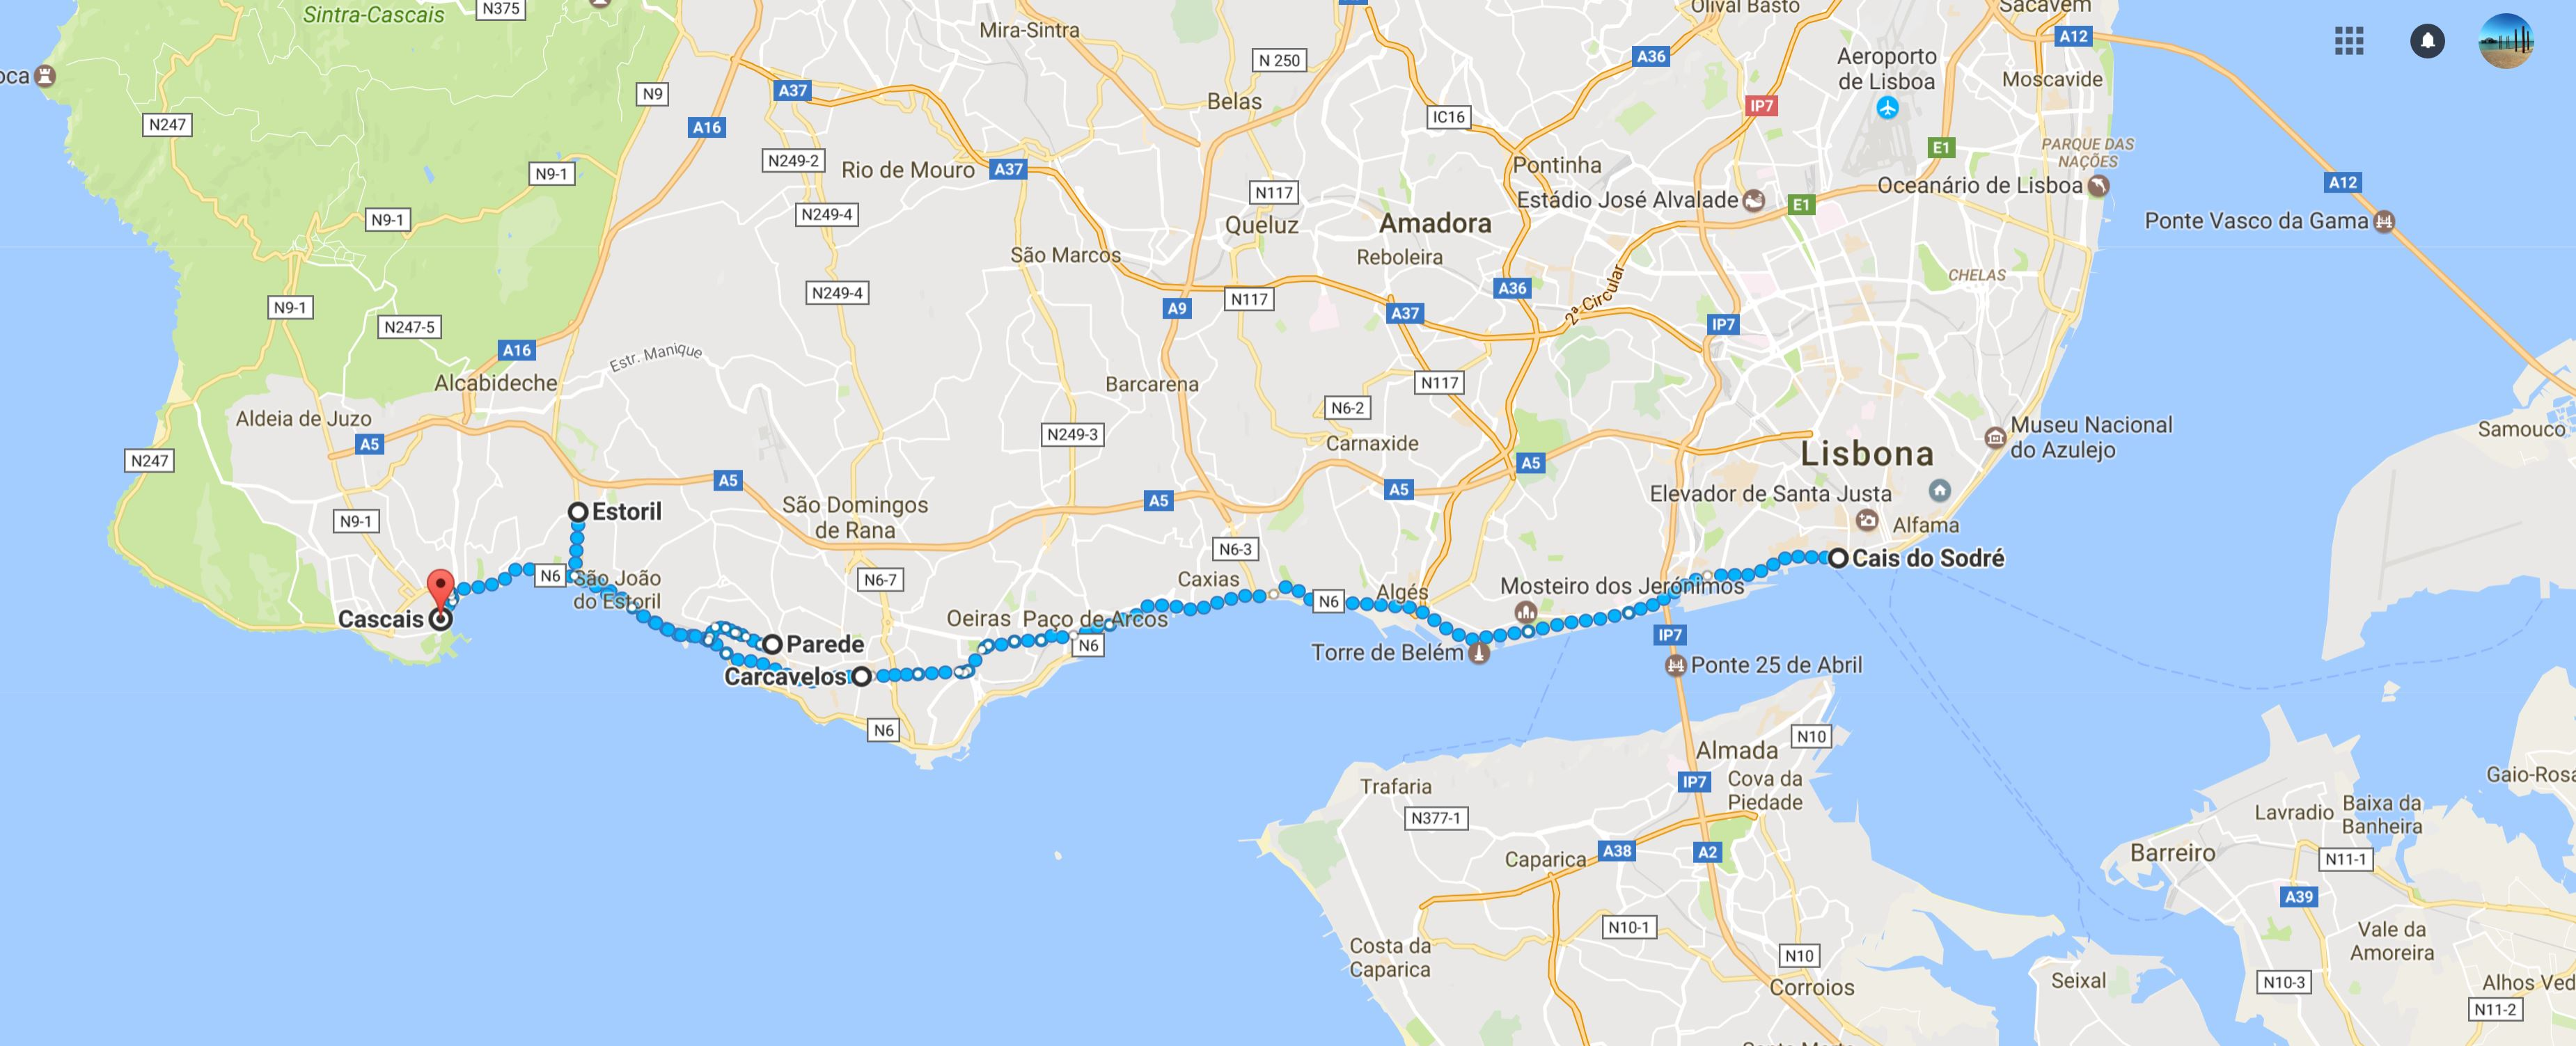 http://blog.zingarate.com/viverealisbona/wp-content/uploads/2017/04/dove-andare-al-mare-a-lisbona-3.jpg